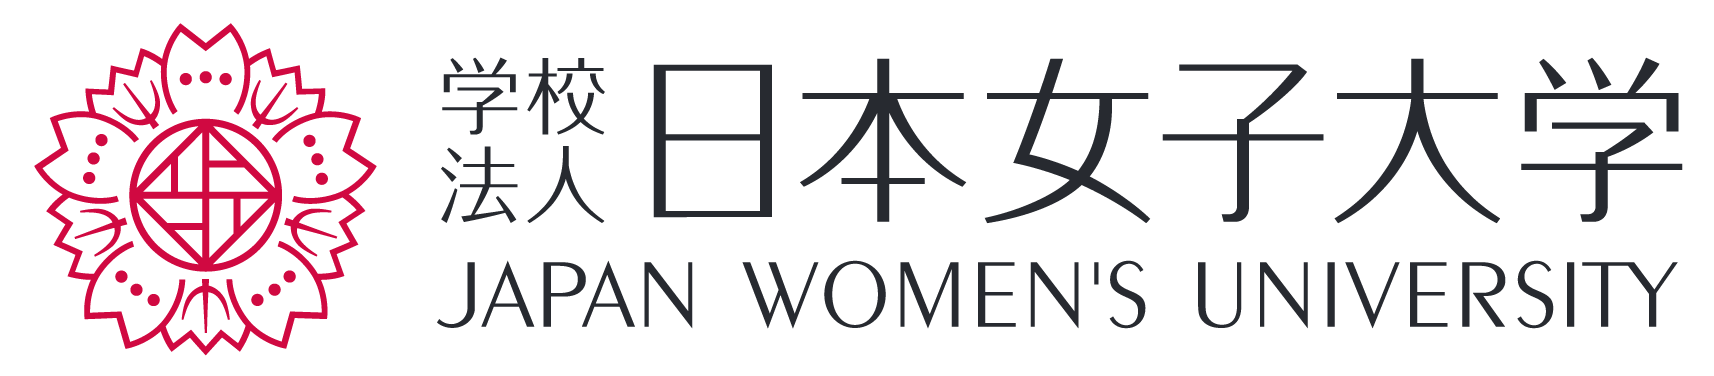 JWU (University) logo